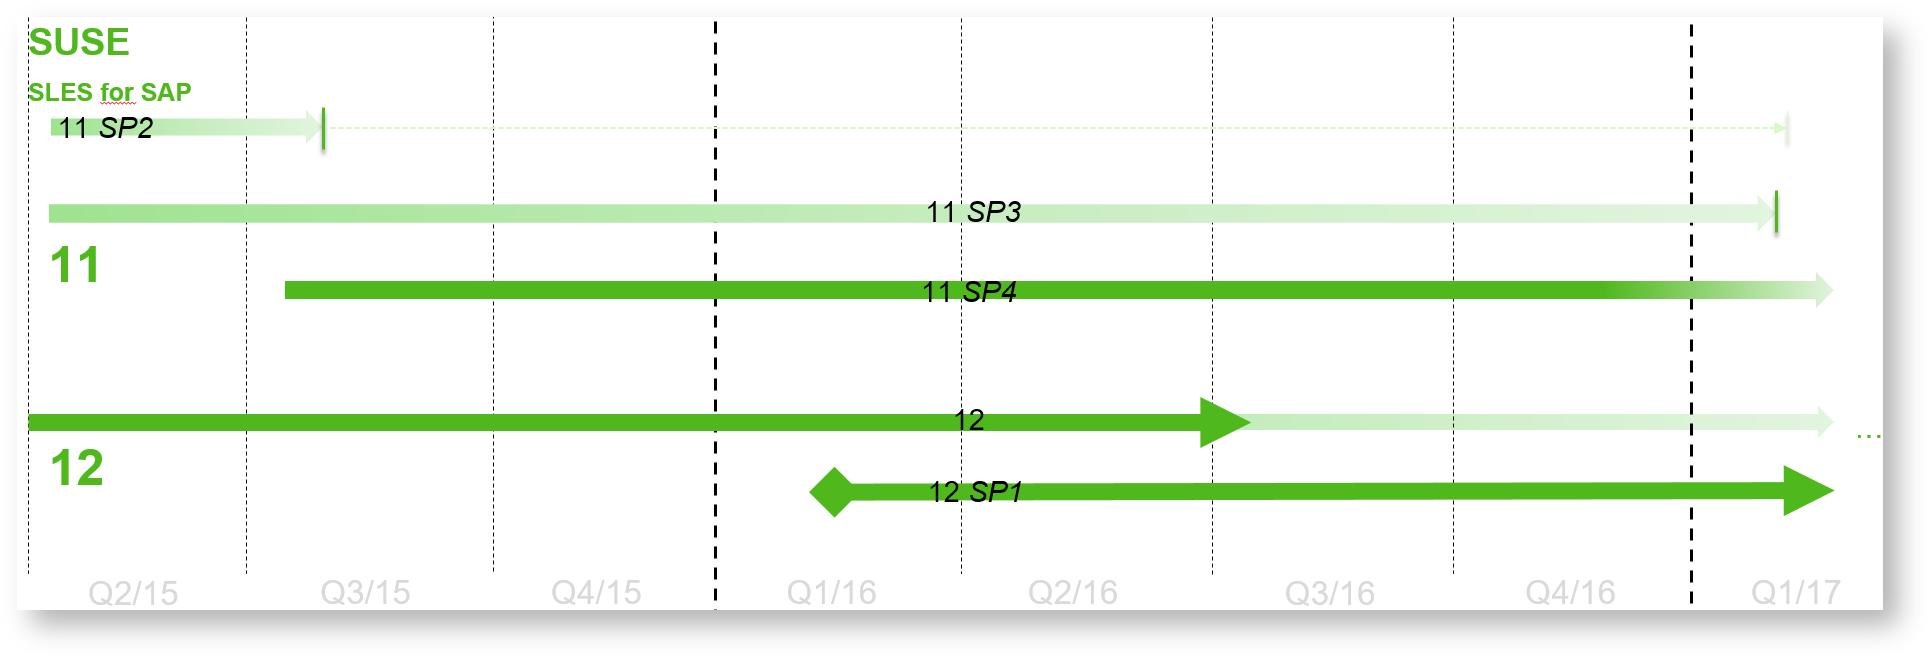 suse linux enterprise server for sap applications 12 download